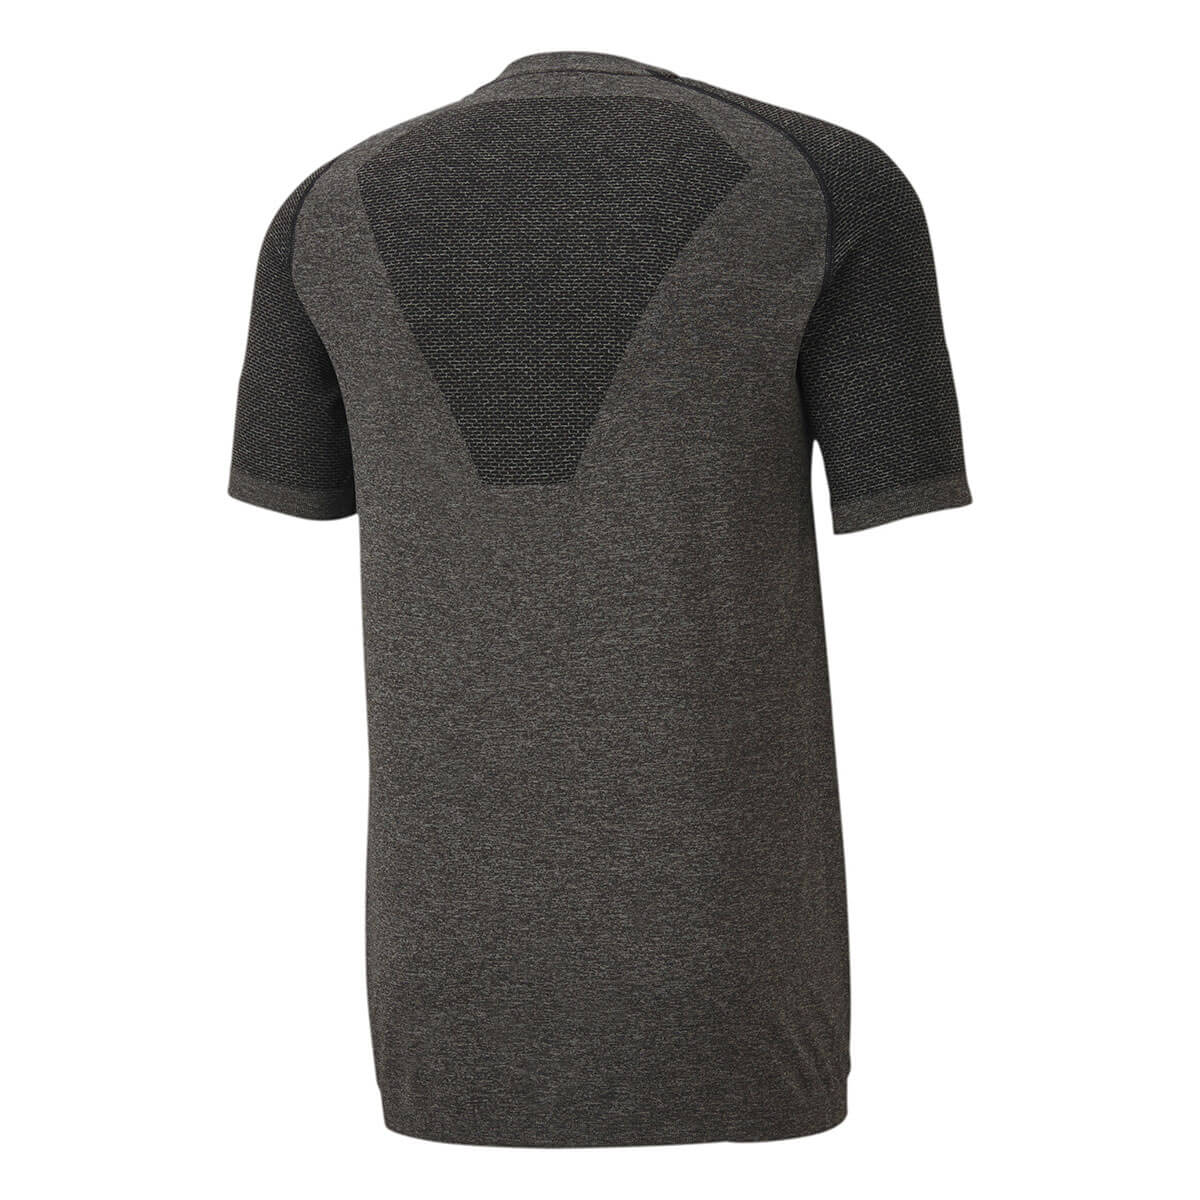 Camiseta Puma RTG Evoknit Basic Tee Preto